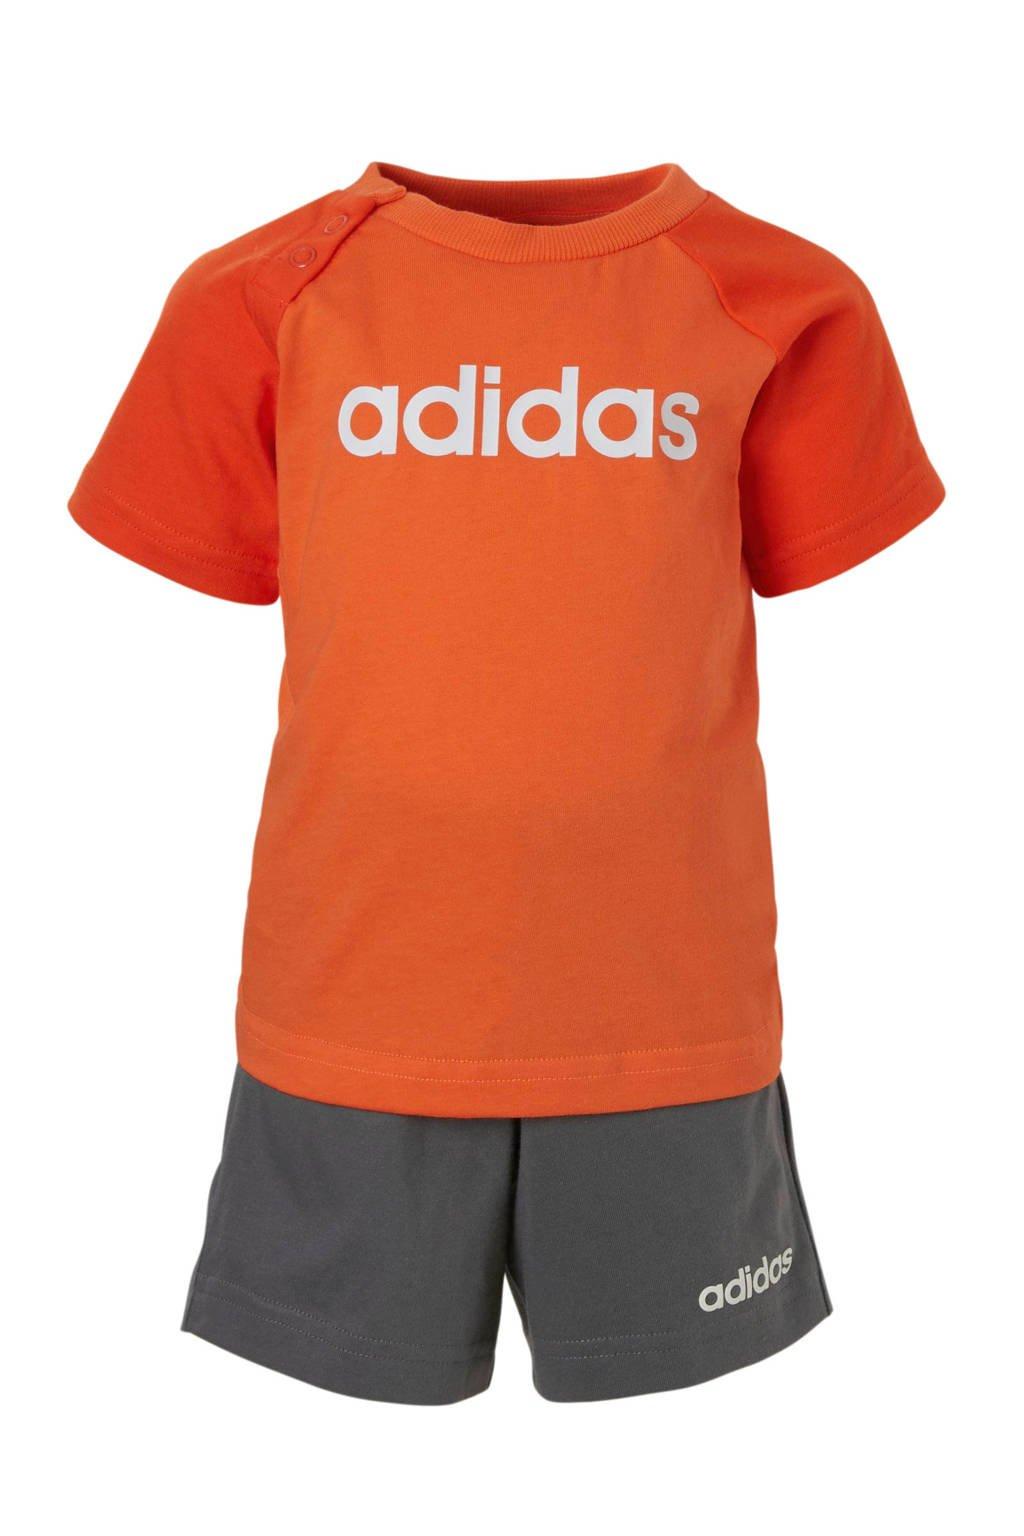 adidas performance T-shirt en short rood/antraciet